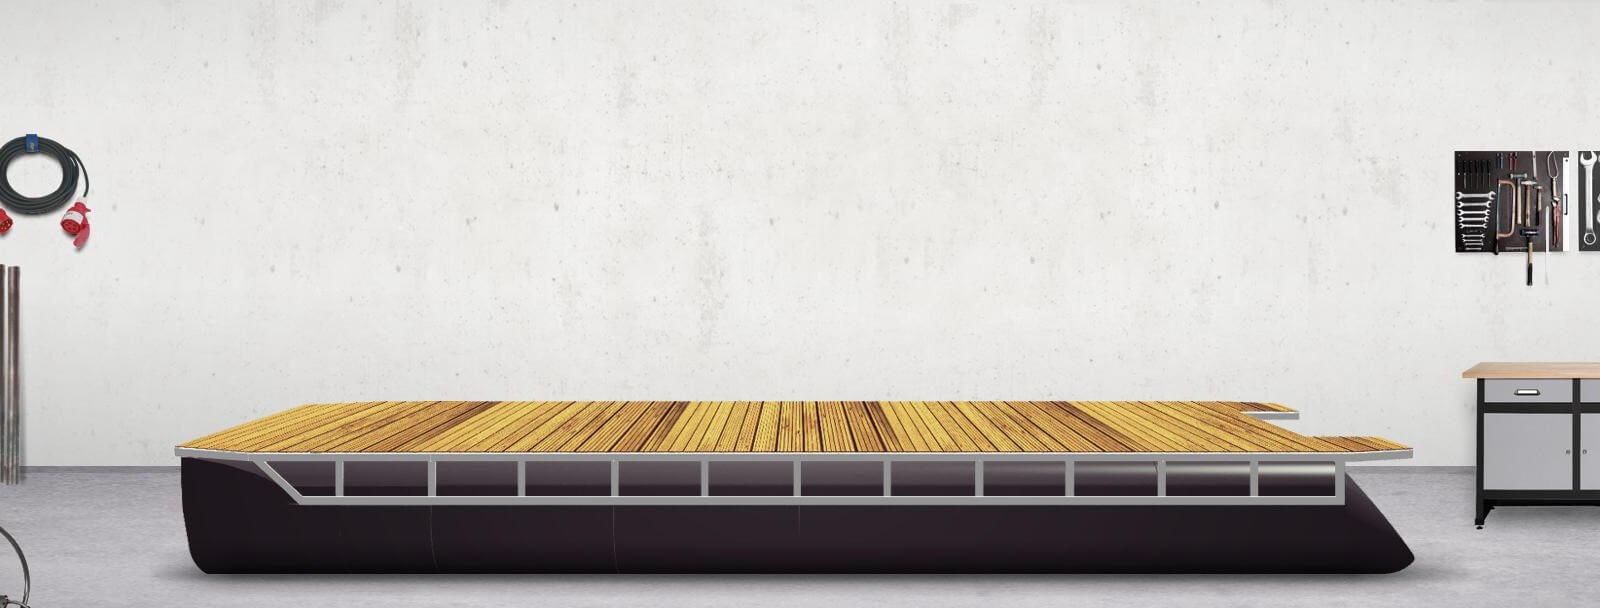 Decksbelag (Holz, Lärche)